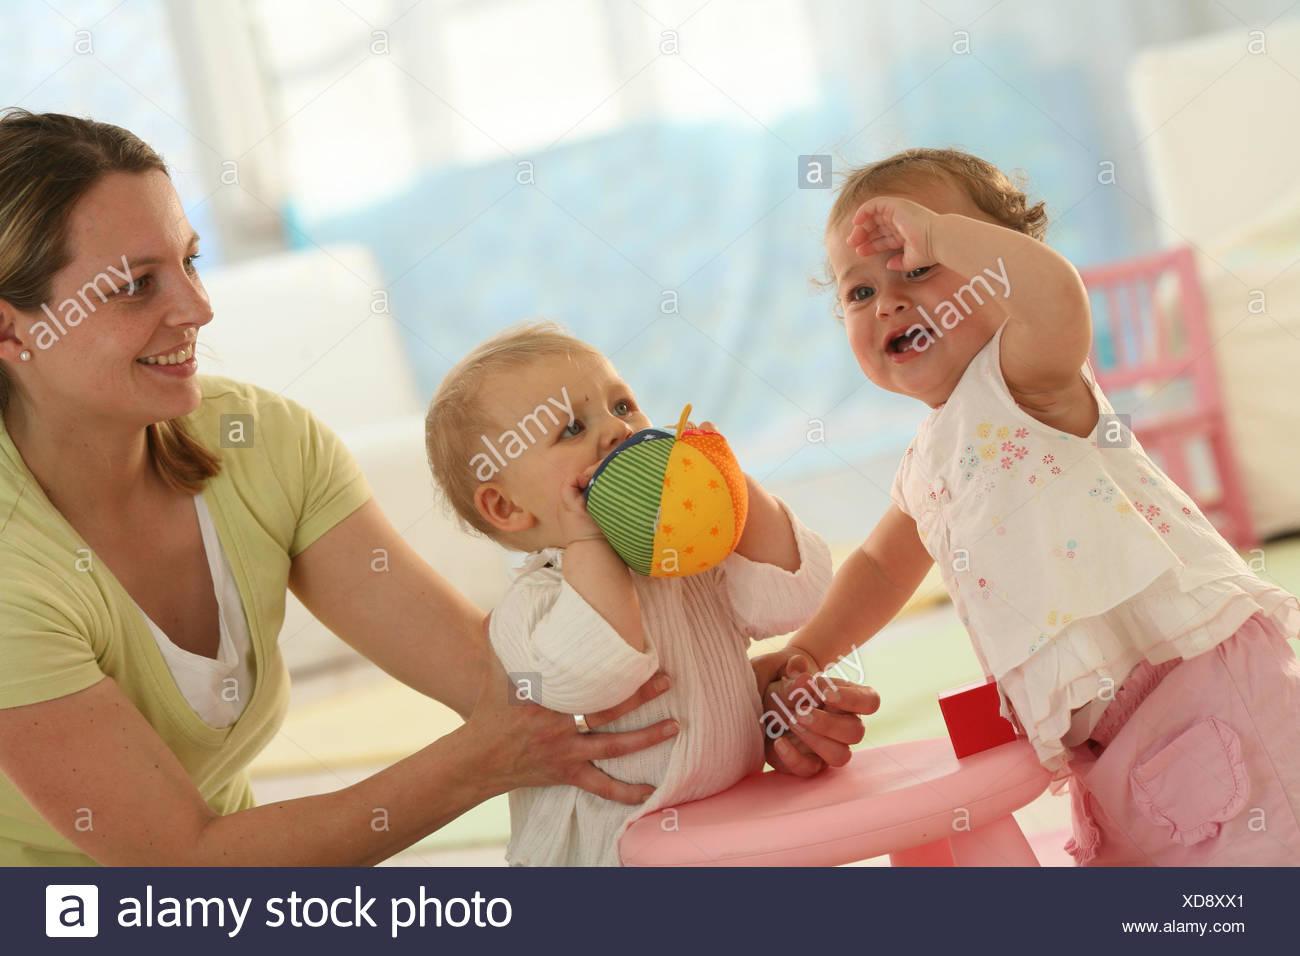 Babies 9 Months Mother Ball Play Get Up Ball Dressed Blond